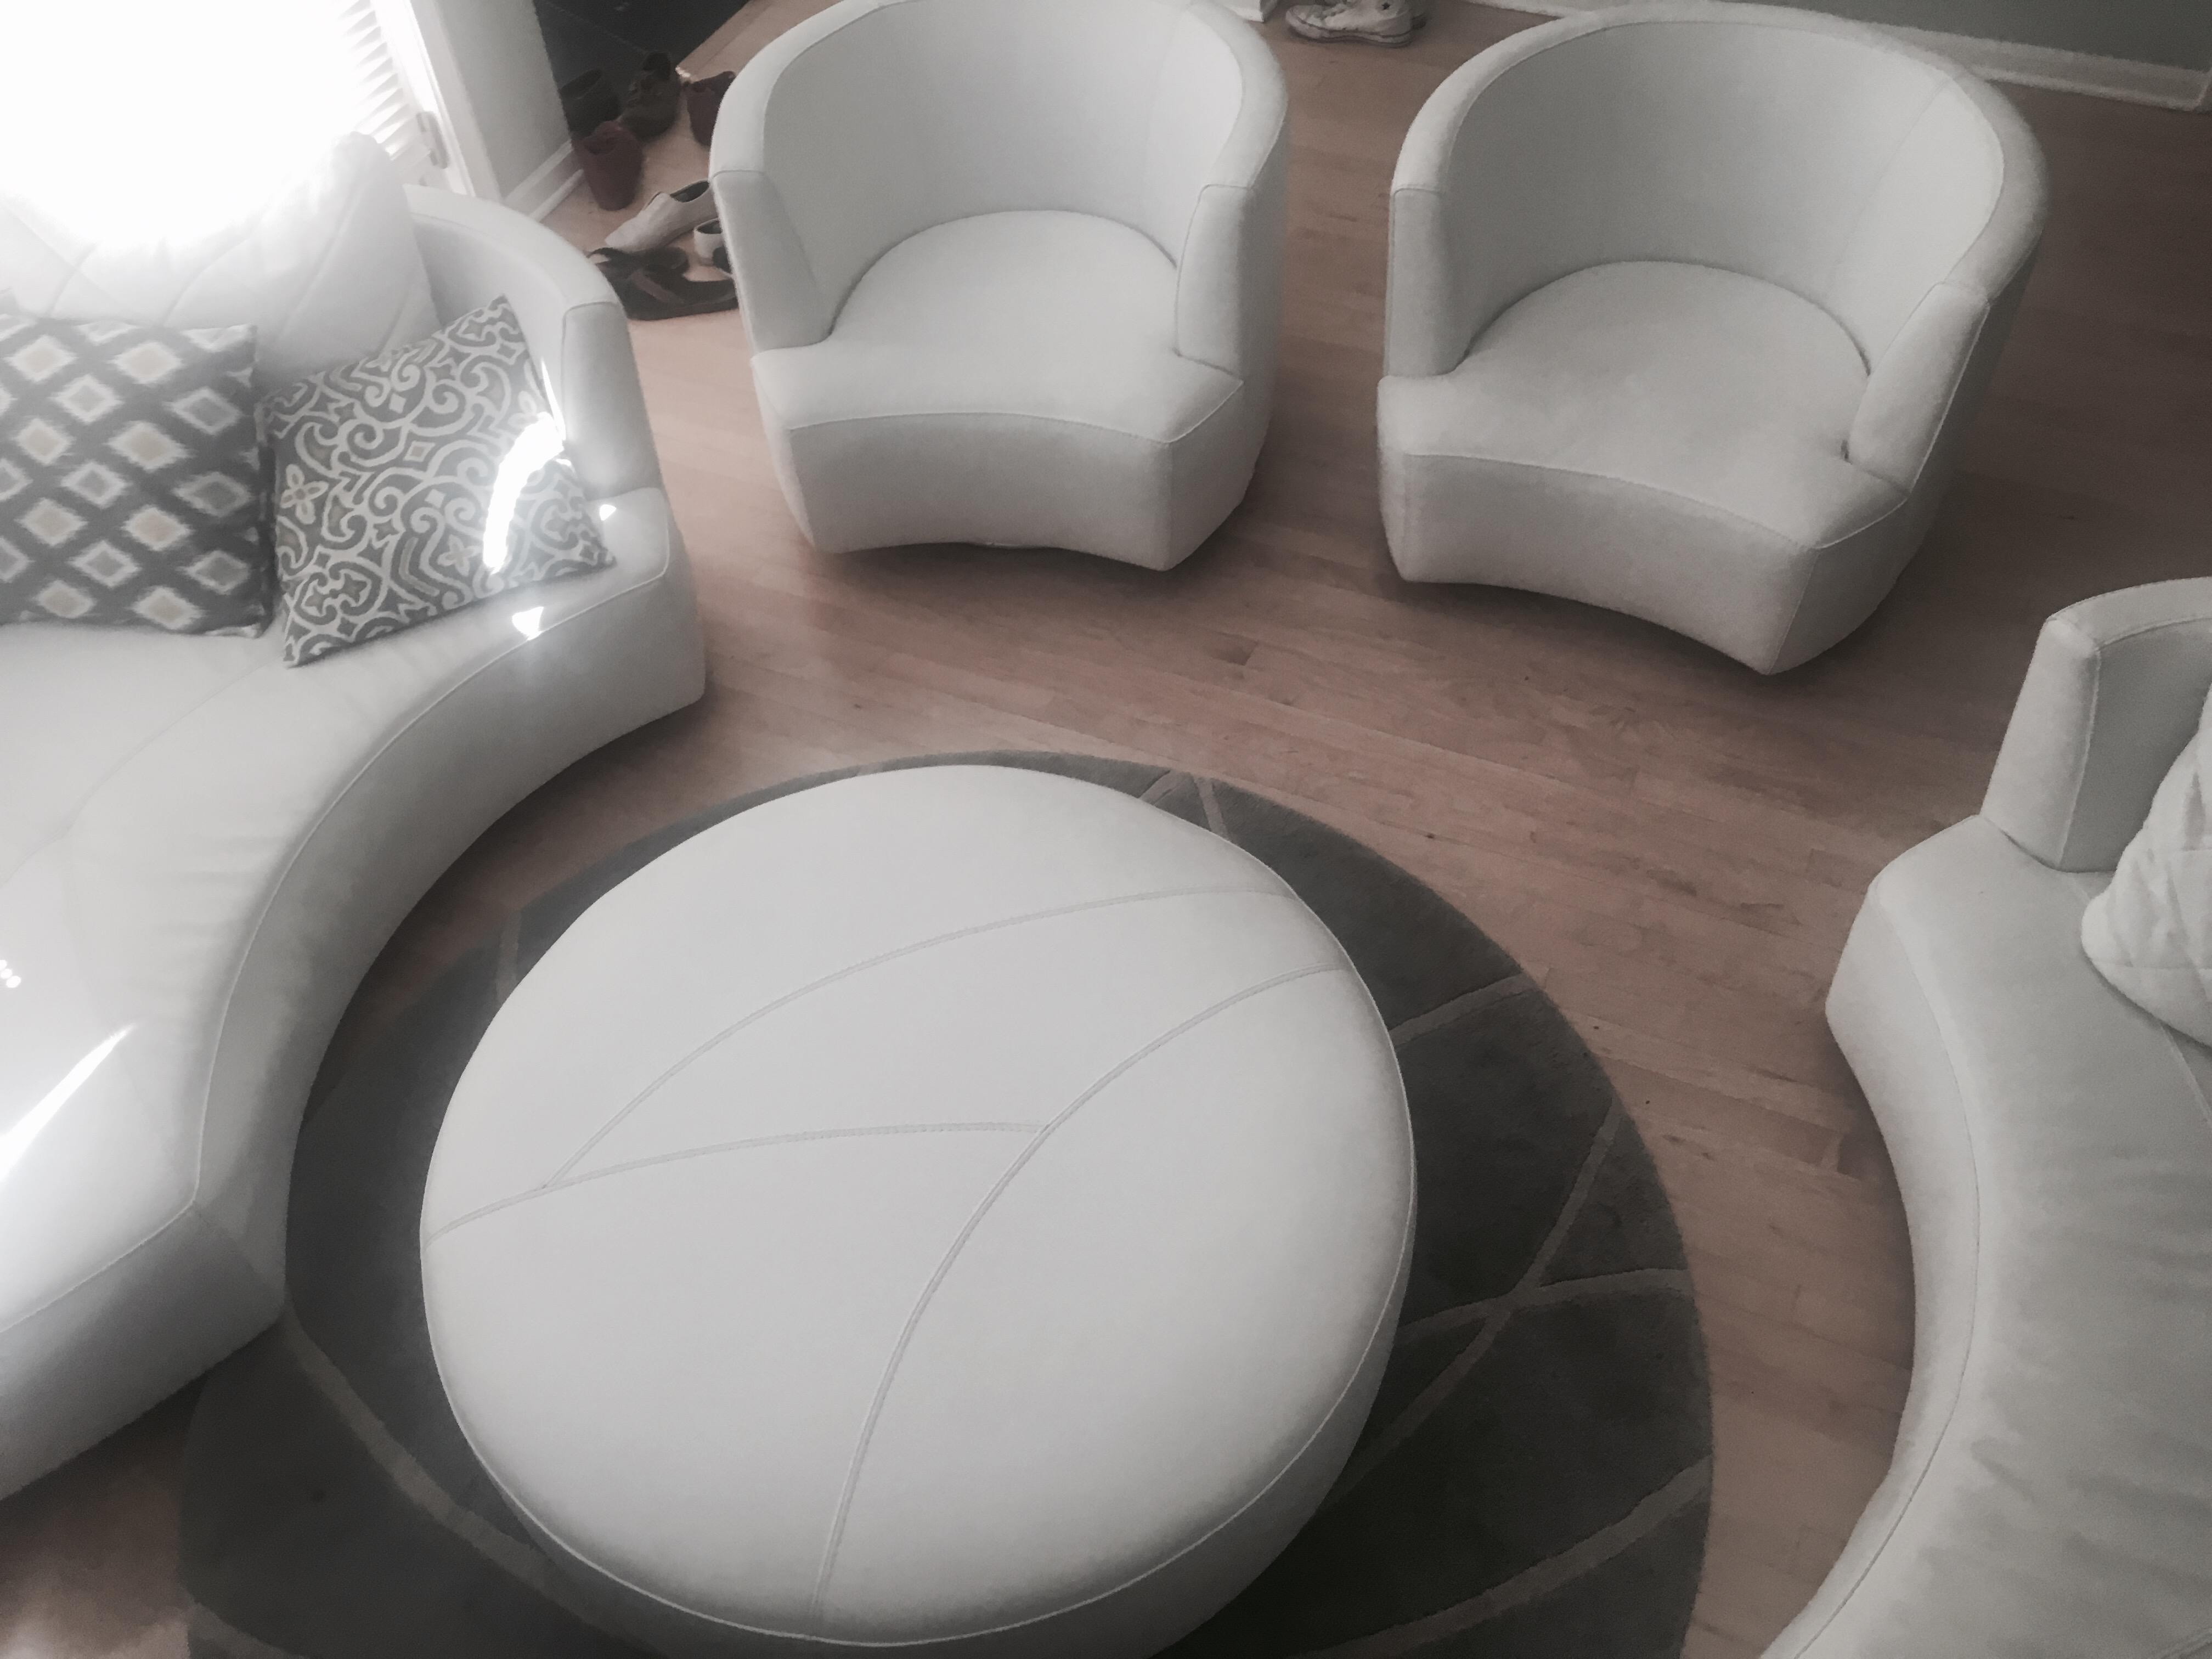 roche bobois white leather ottoman image 3 of 3